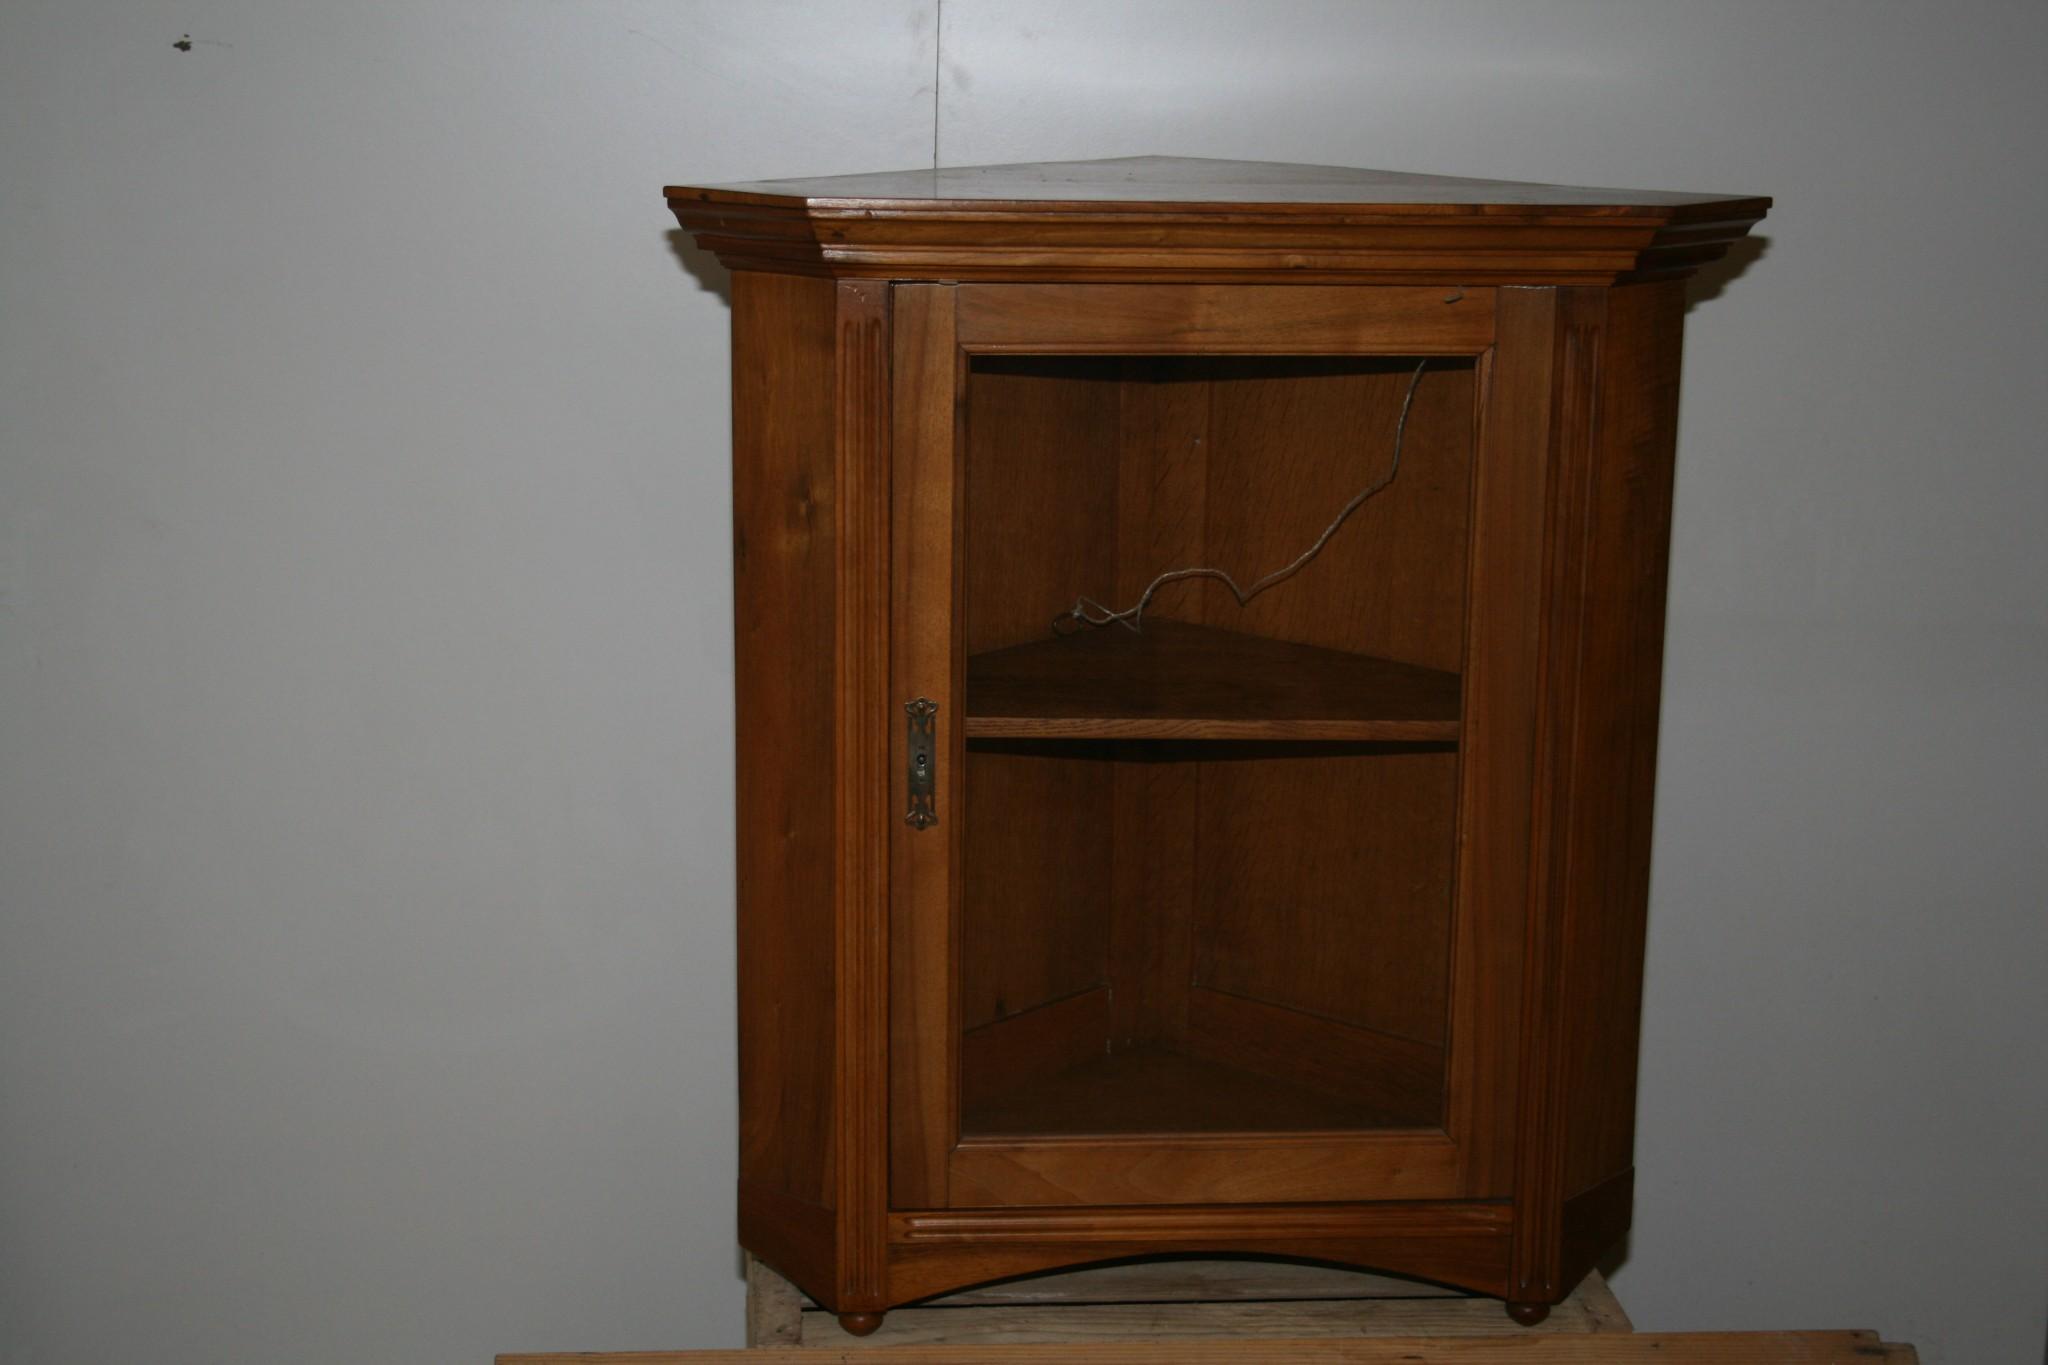 eckvitrine aus nussbaumholz don jos old antiques and vintage don jos old antiques and vintage. Black Bedroom Furniture Sets. Home Design Ideas